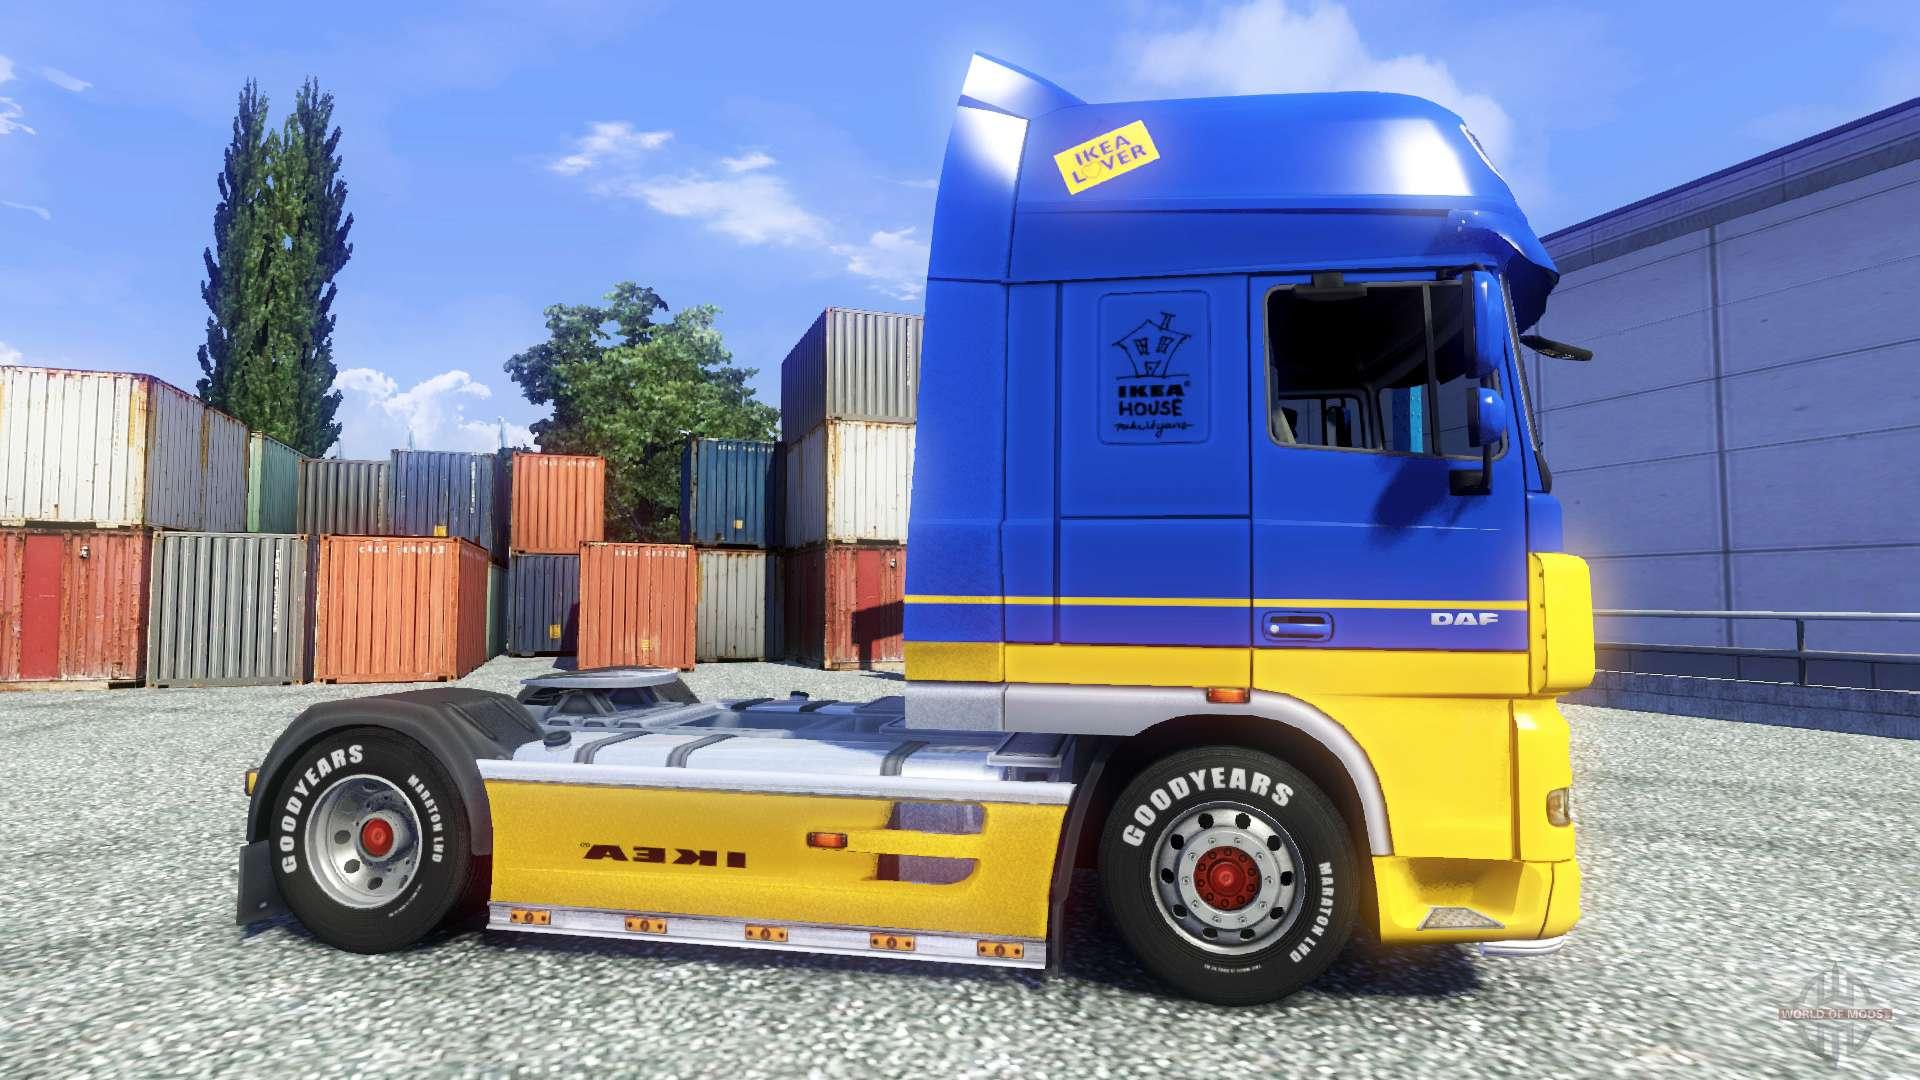 Skin ikea for daf xf tractor unit for euro truck simulator 2 for Ikea schlafsofa 79 euro